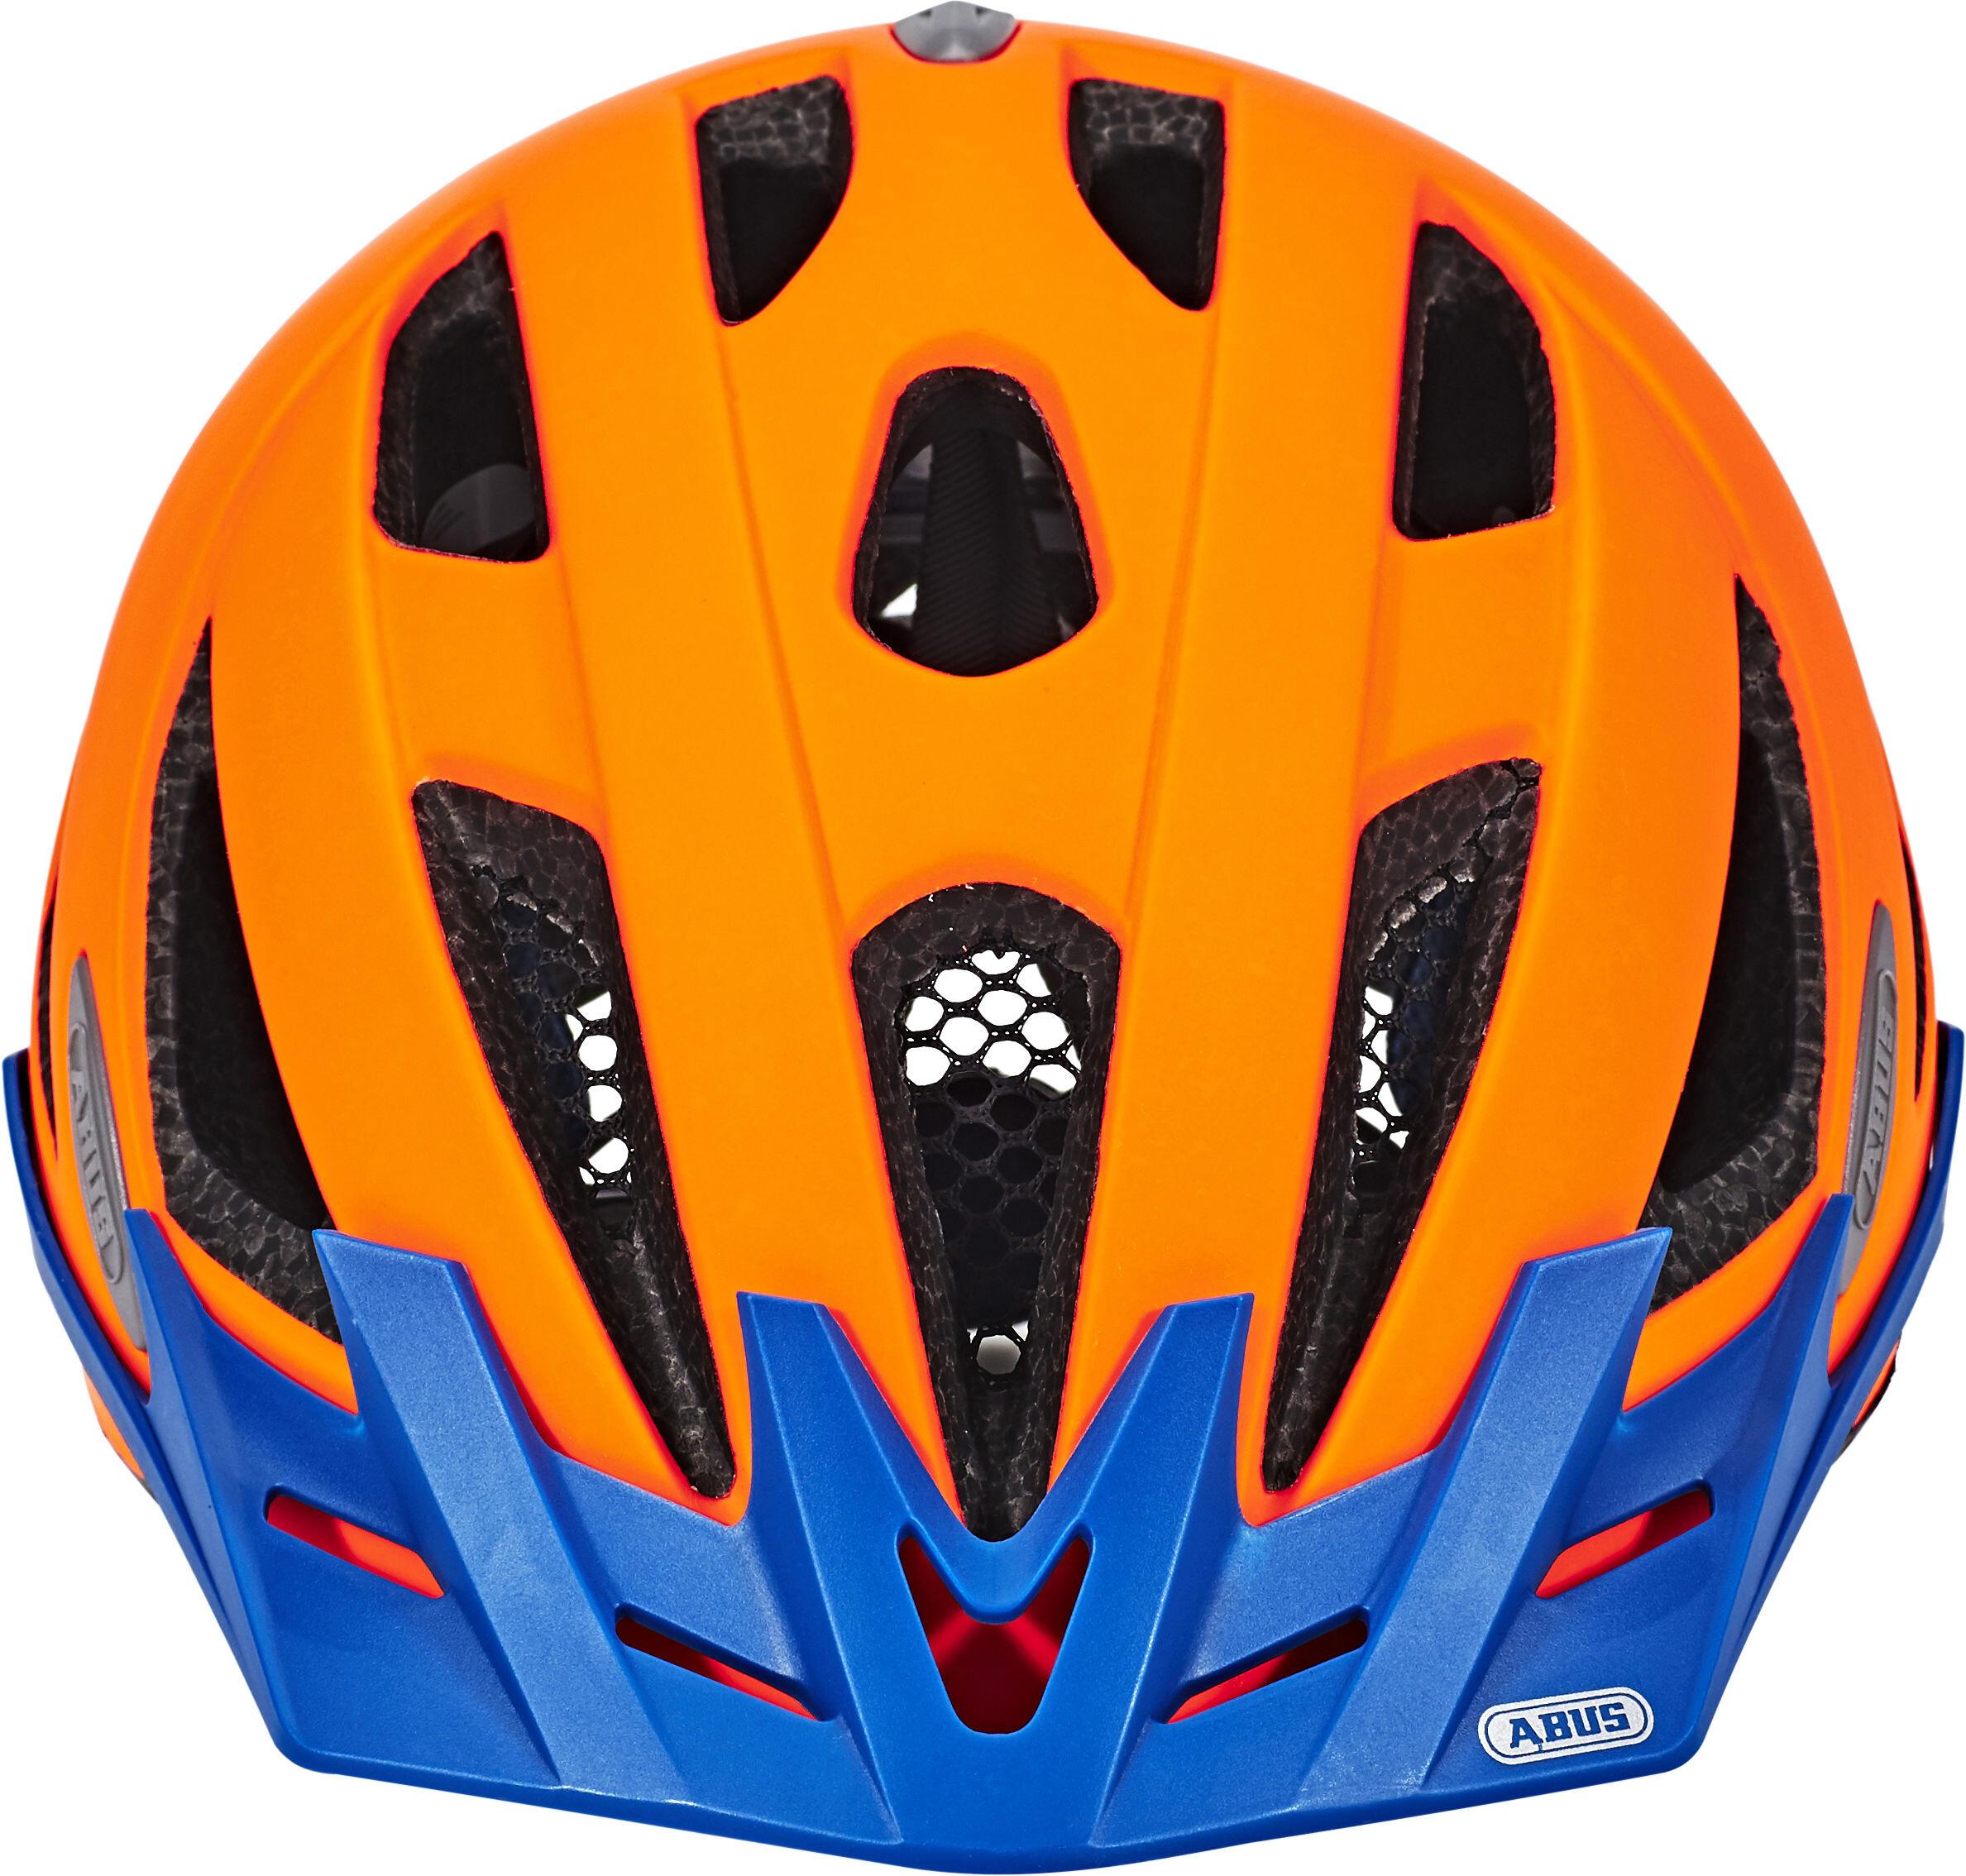 abus urban i 2 0 helmet neon orange online kaufen. Black Bedroom Furniture Sets. Home Design Ideas